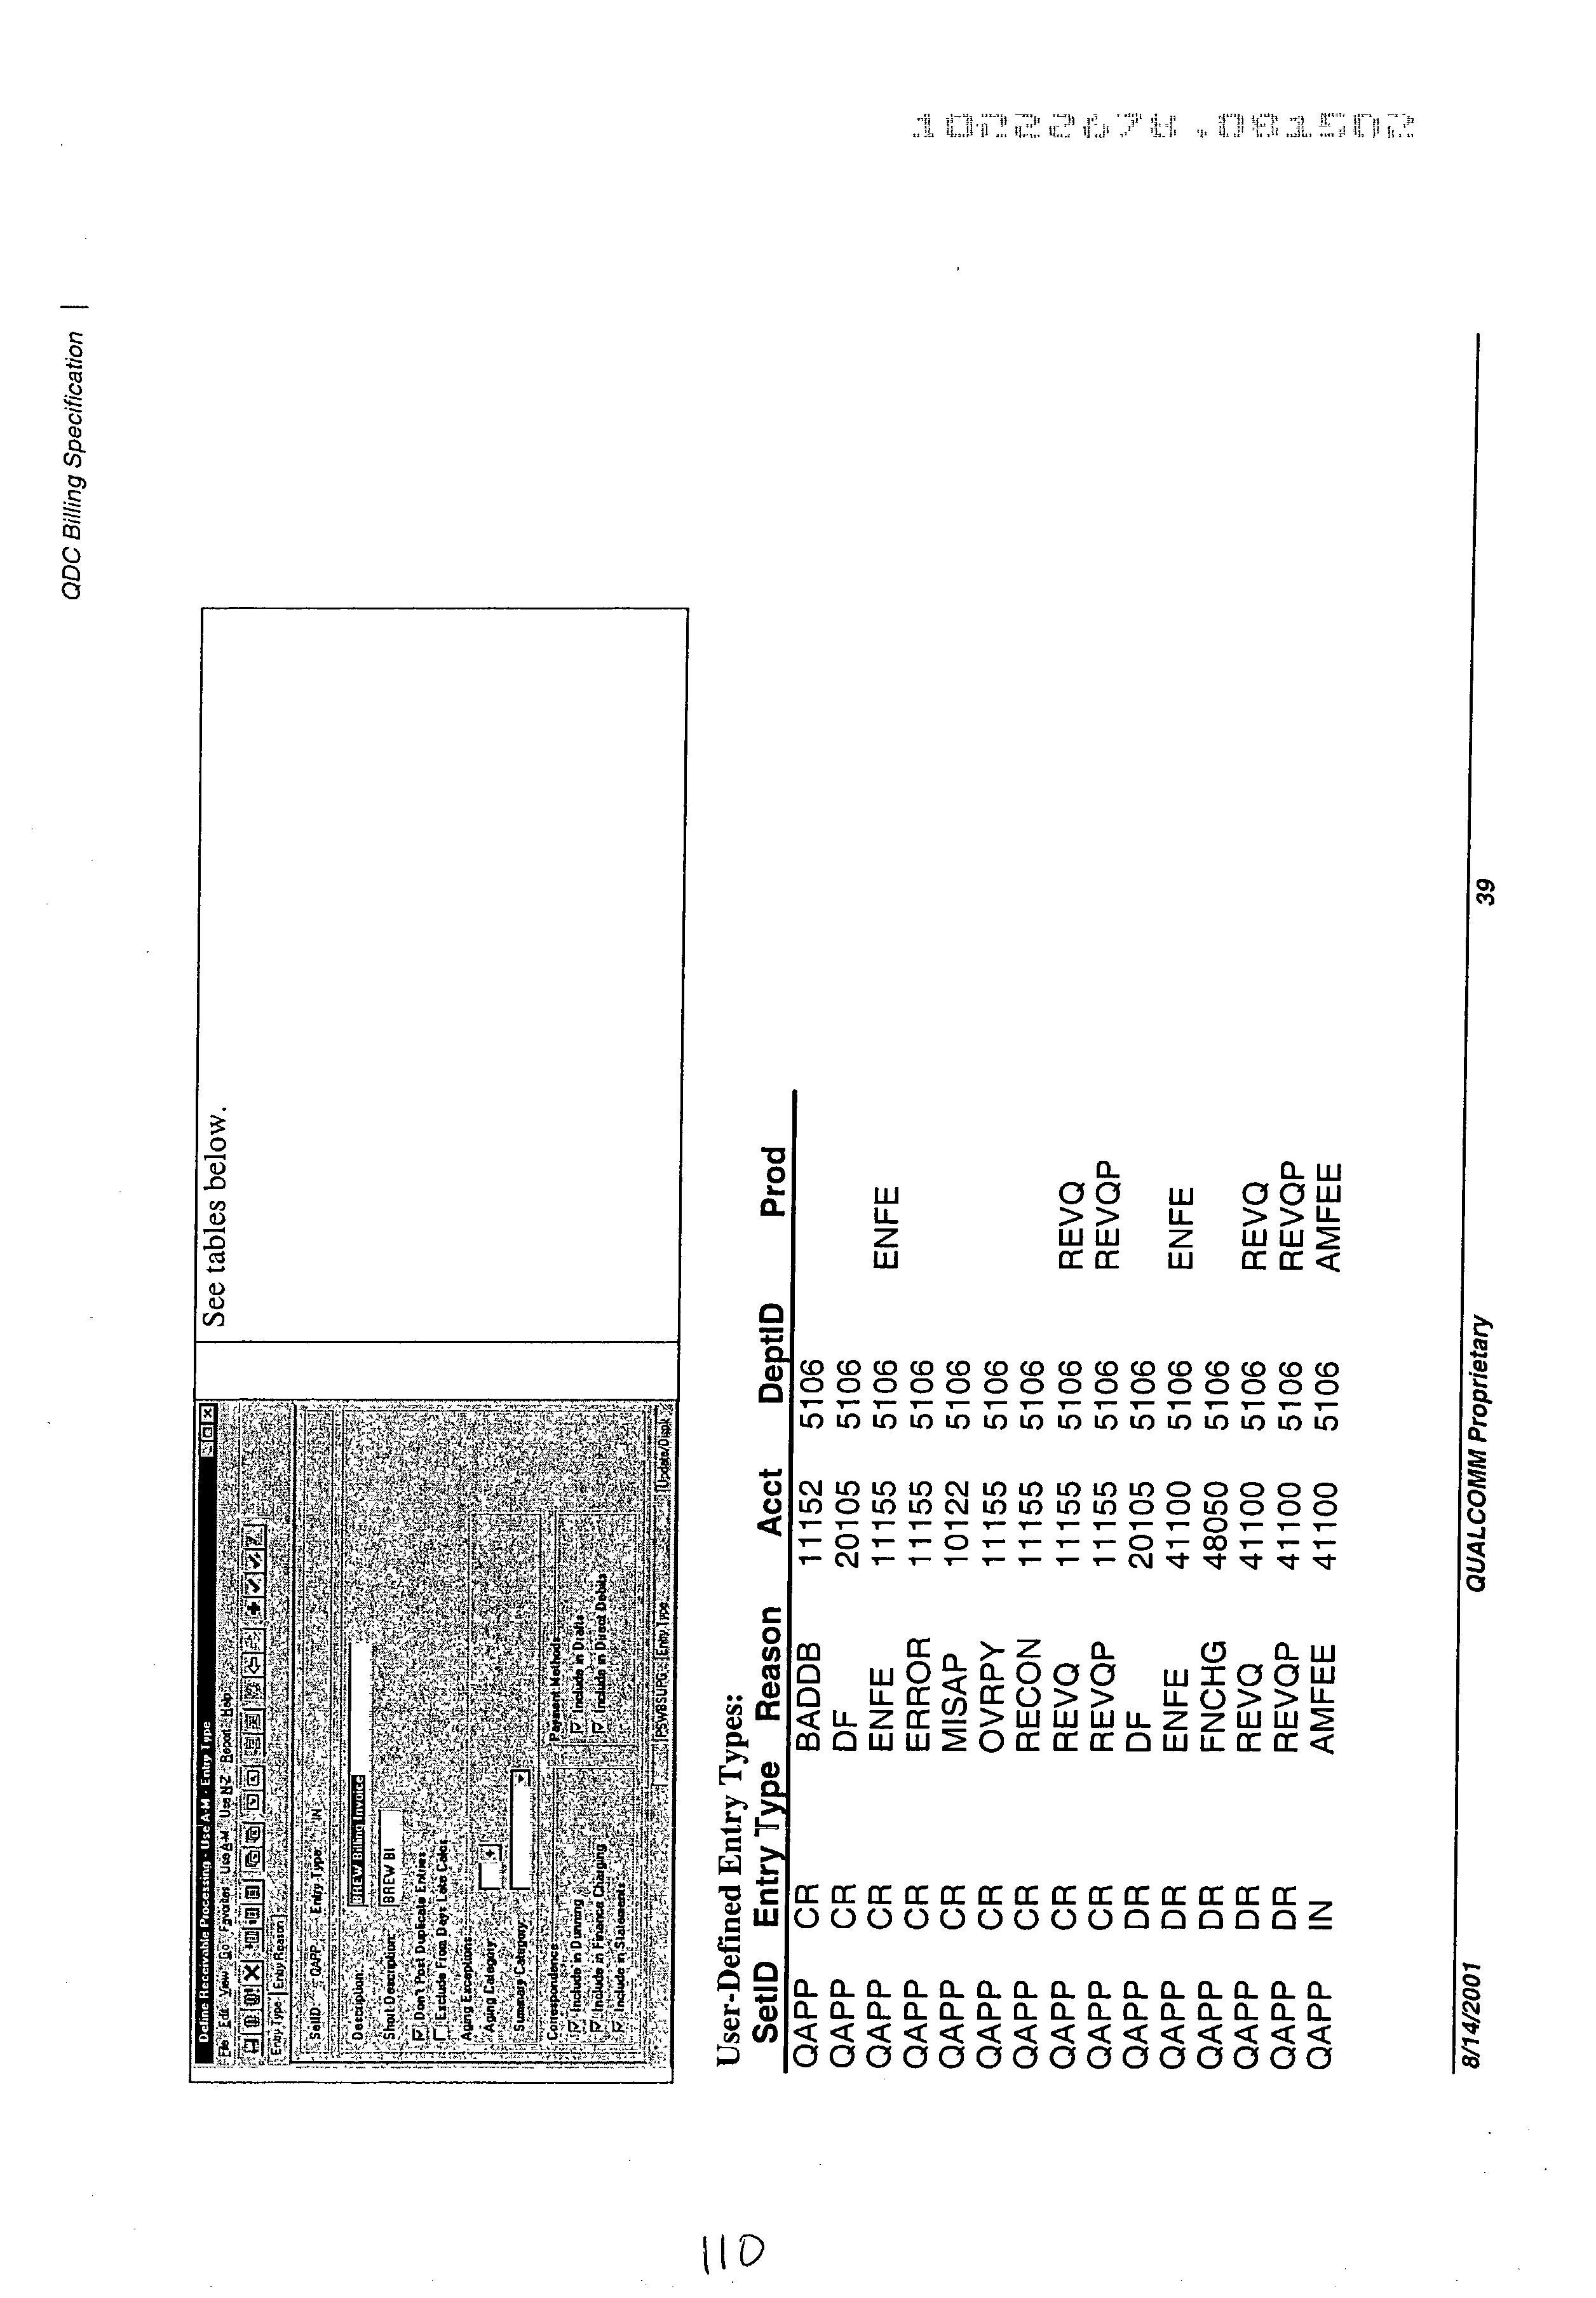 Figure US20030078886A1-20030424-P00106